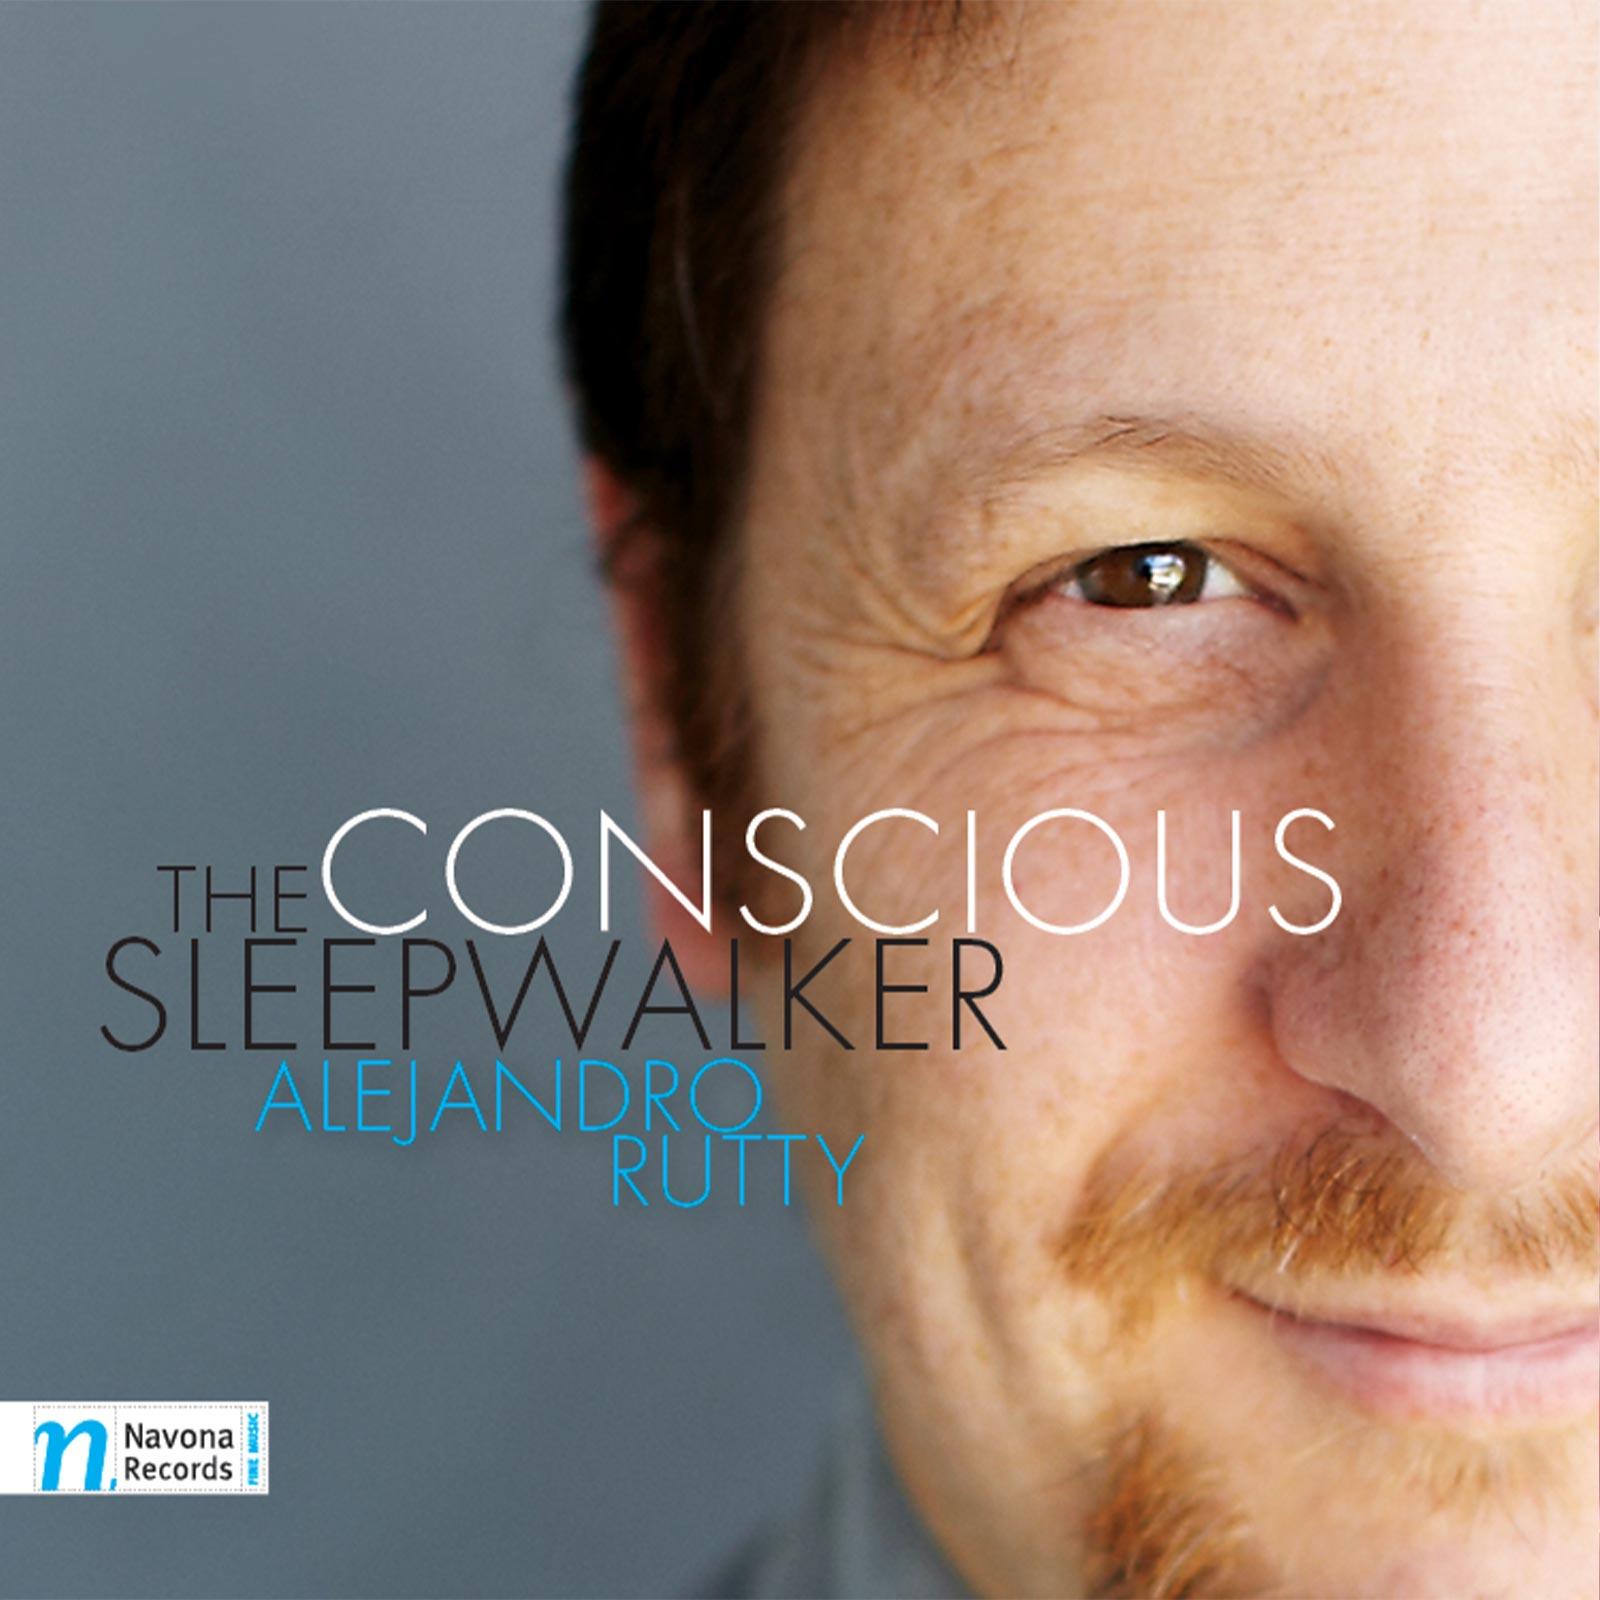 The Conscious Sleepwalker